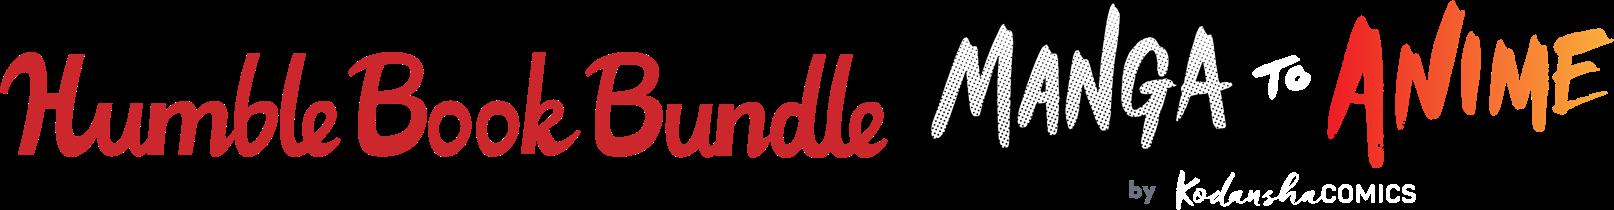 The Humble Manga Bundle: Manga to Anime by Kodansha